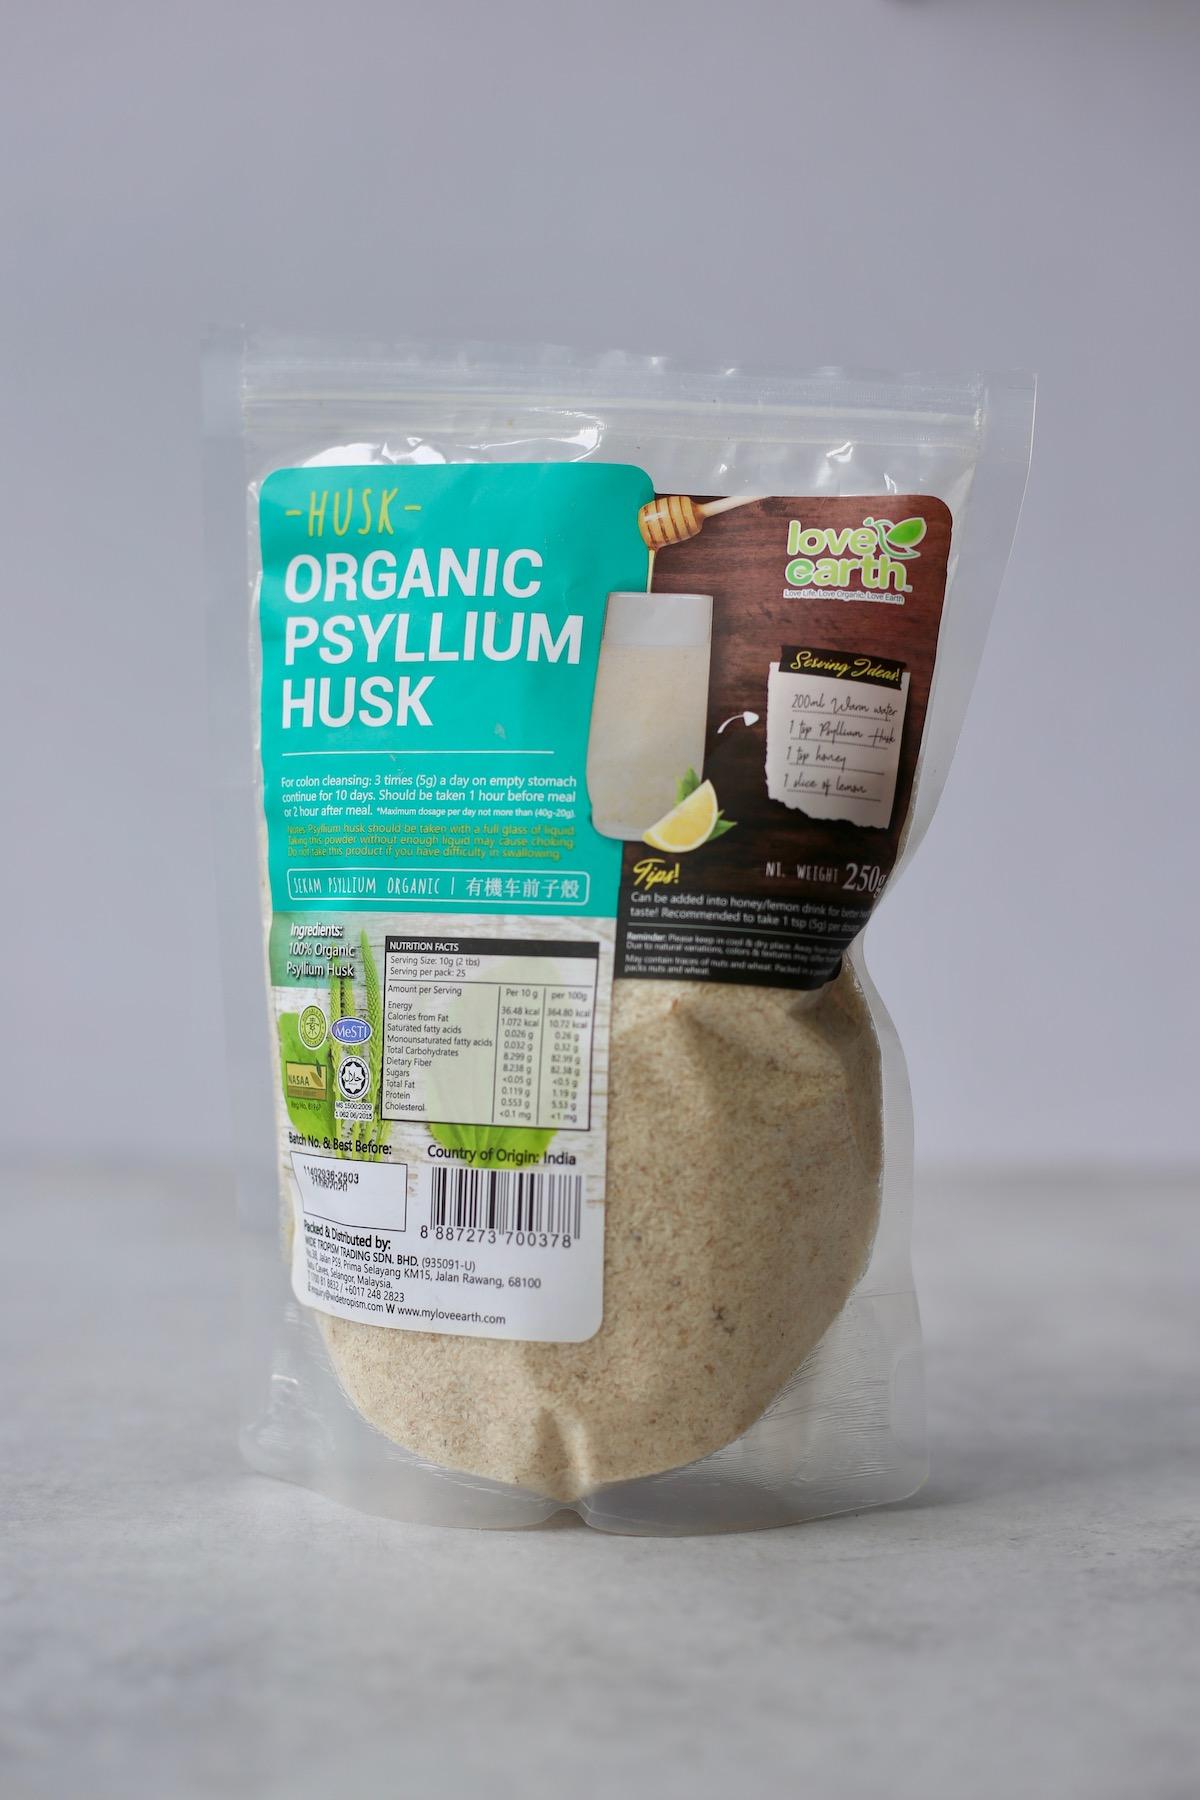 Organic psyllium husk powder being used for gluten free bread